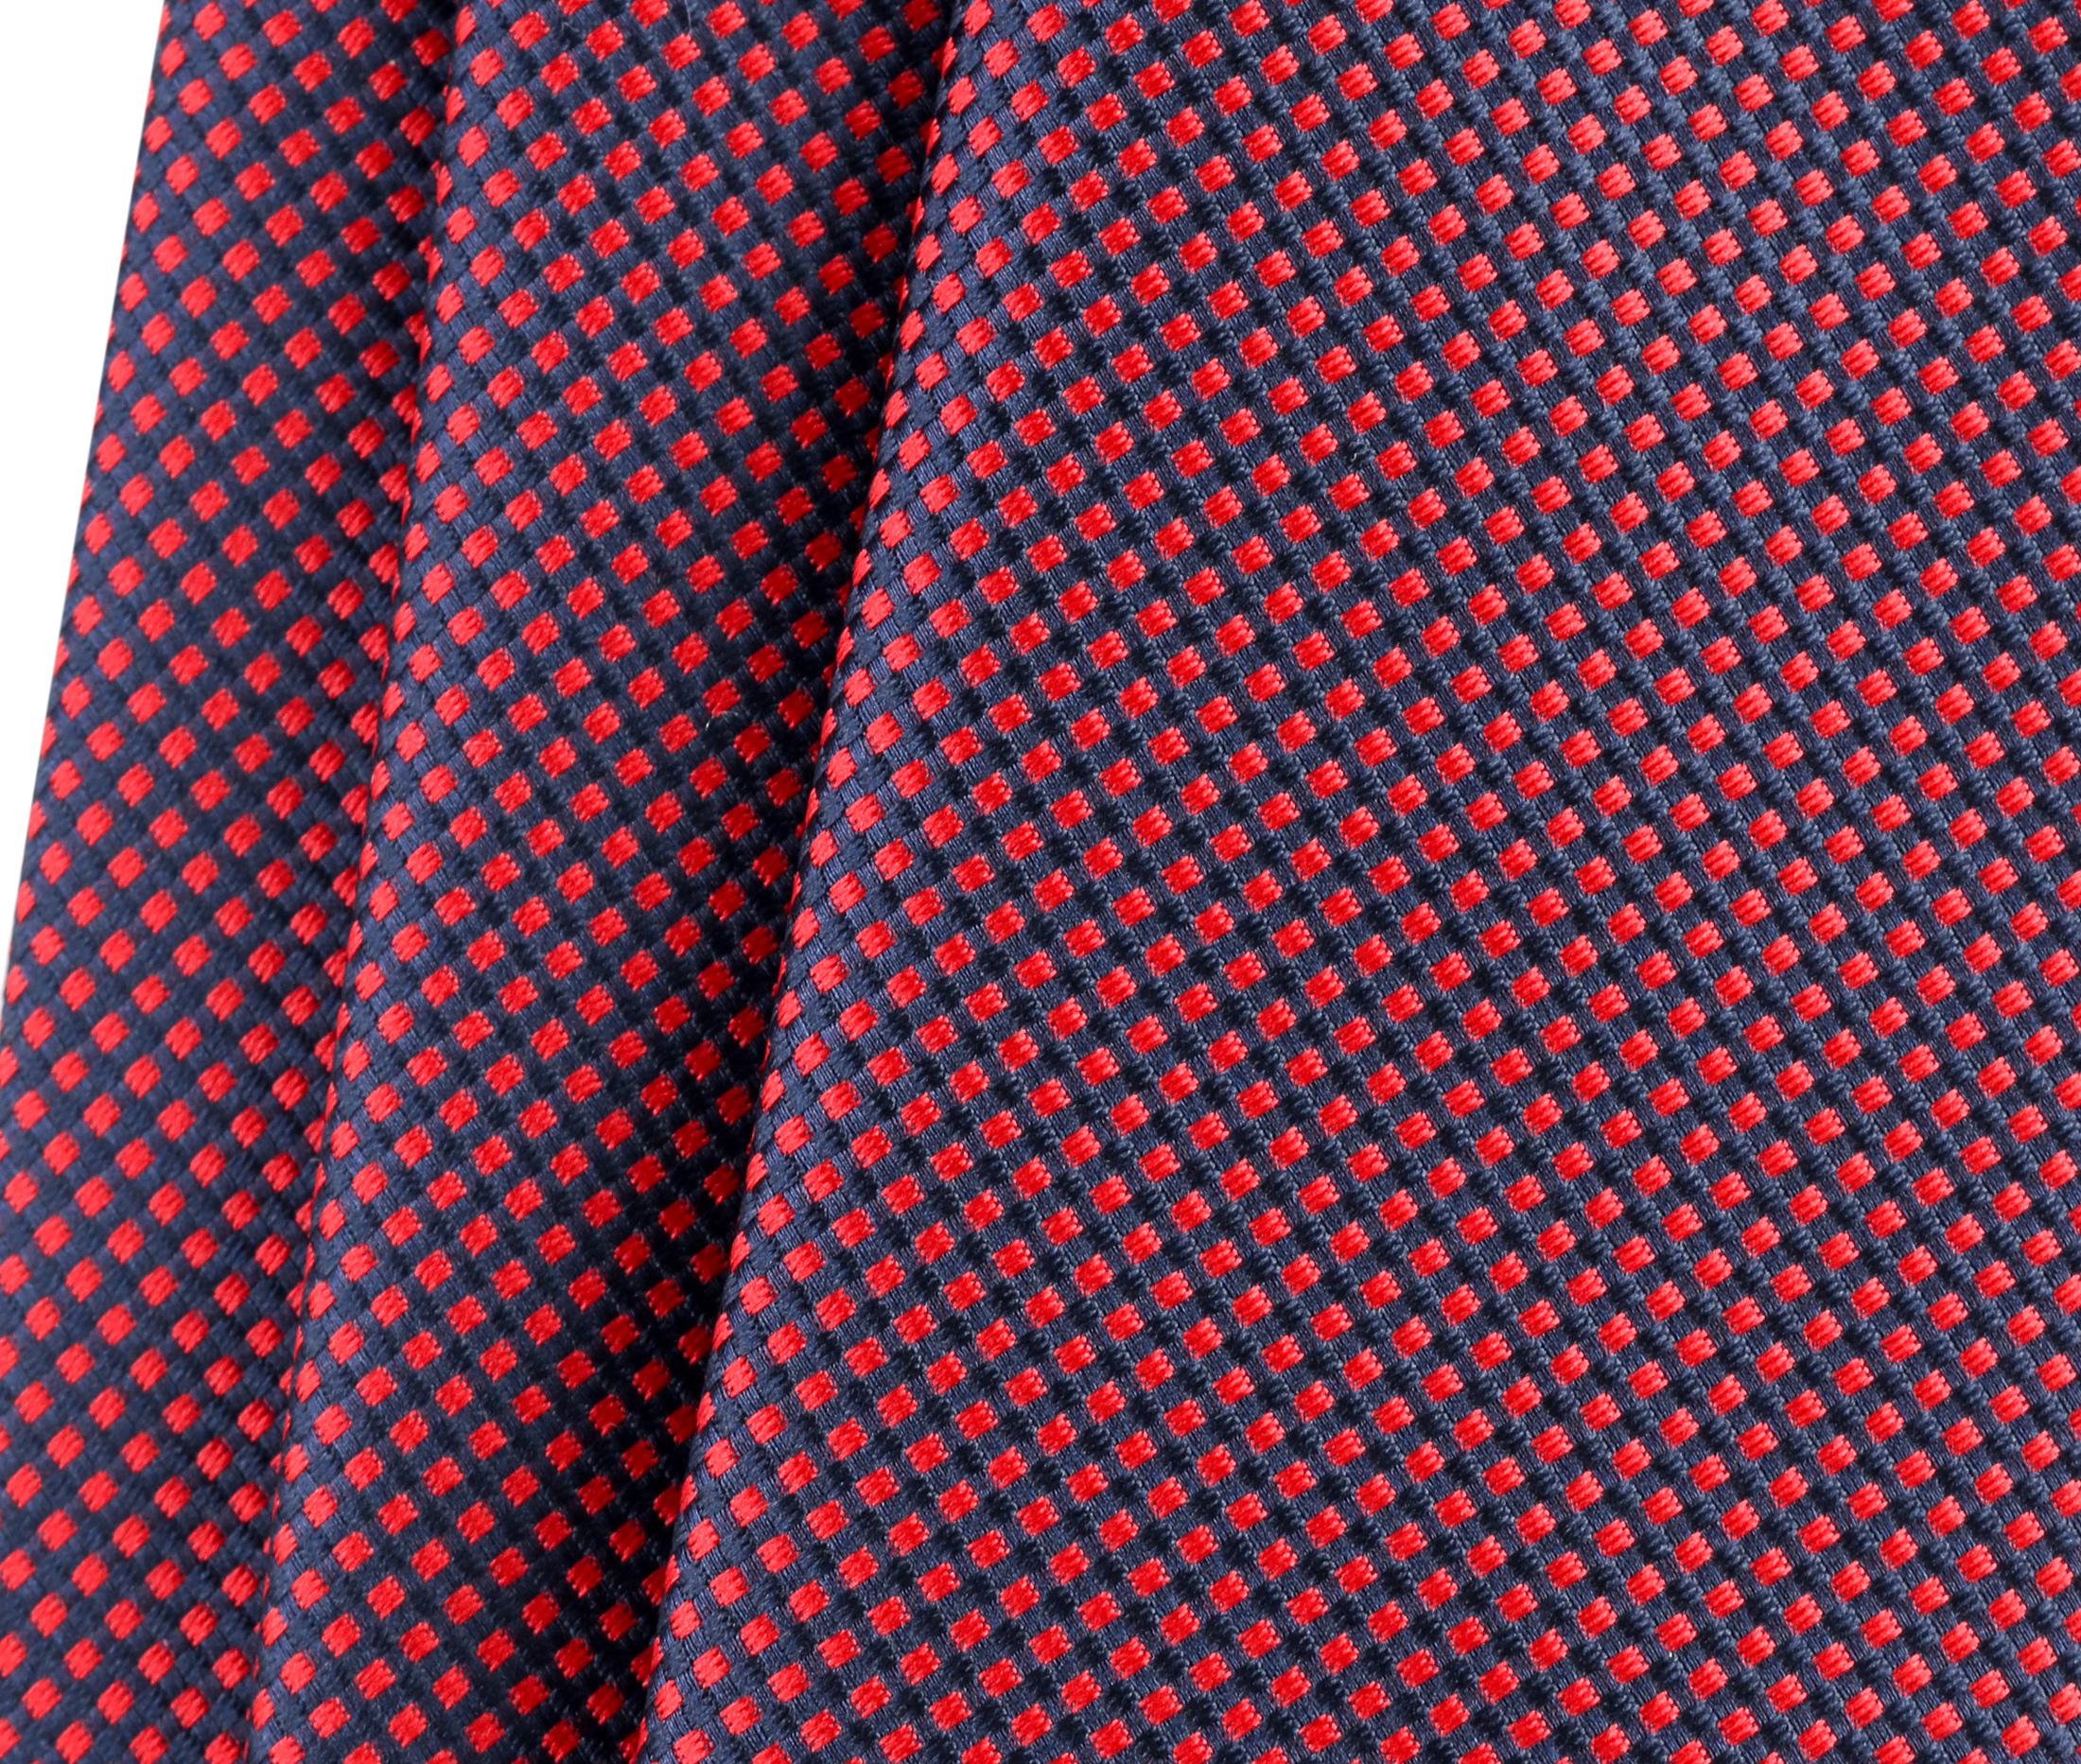 Krawatte Seide Karo Rot 9-17 foto 2